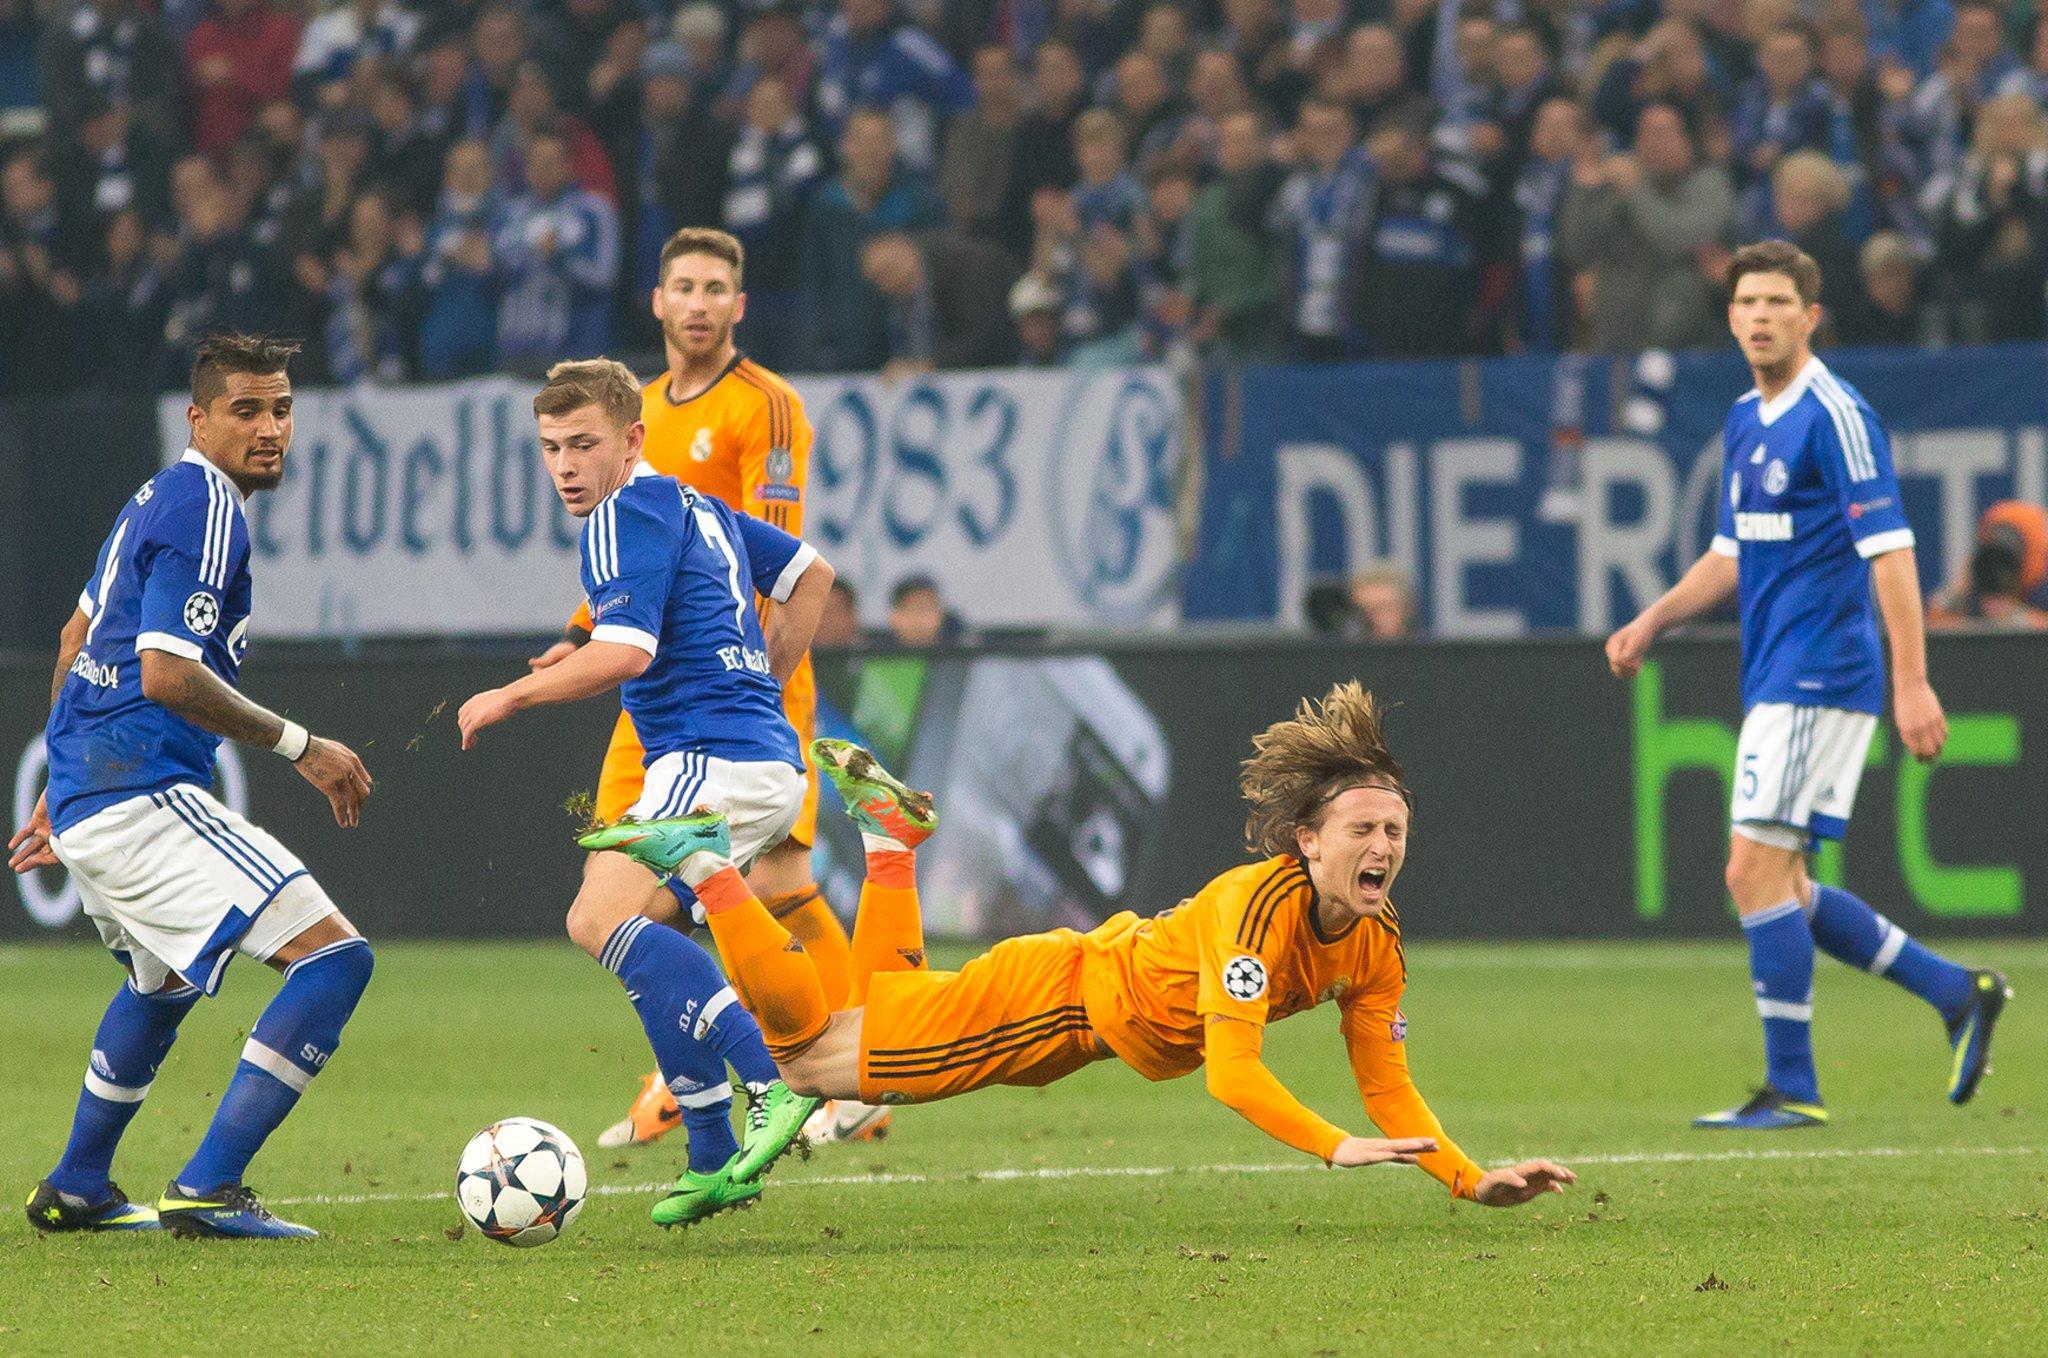 Real Gegen Schalke